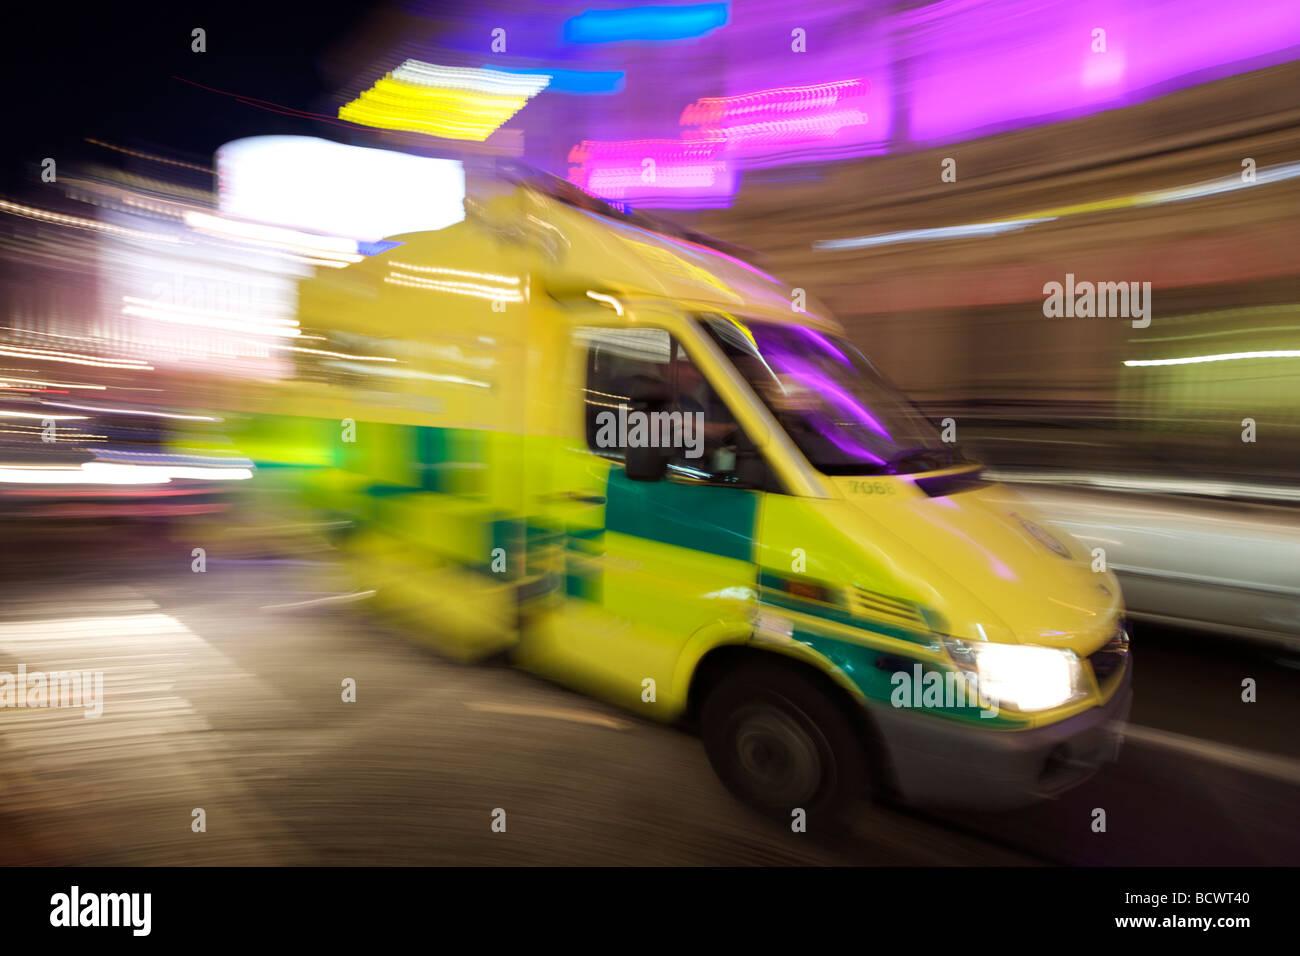 An ambulance races along a London street at night. - Stock Image